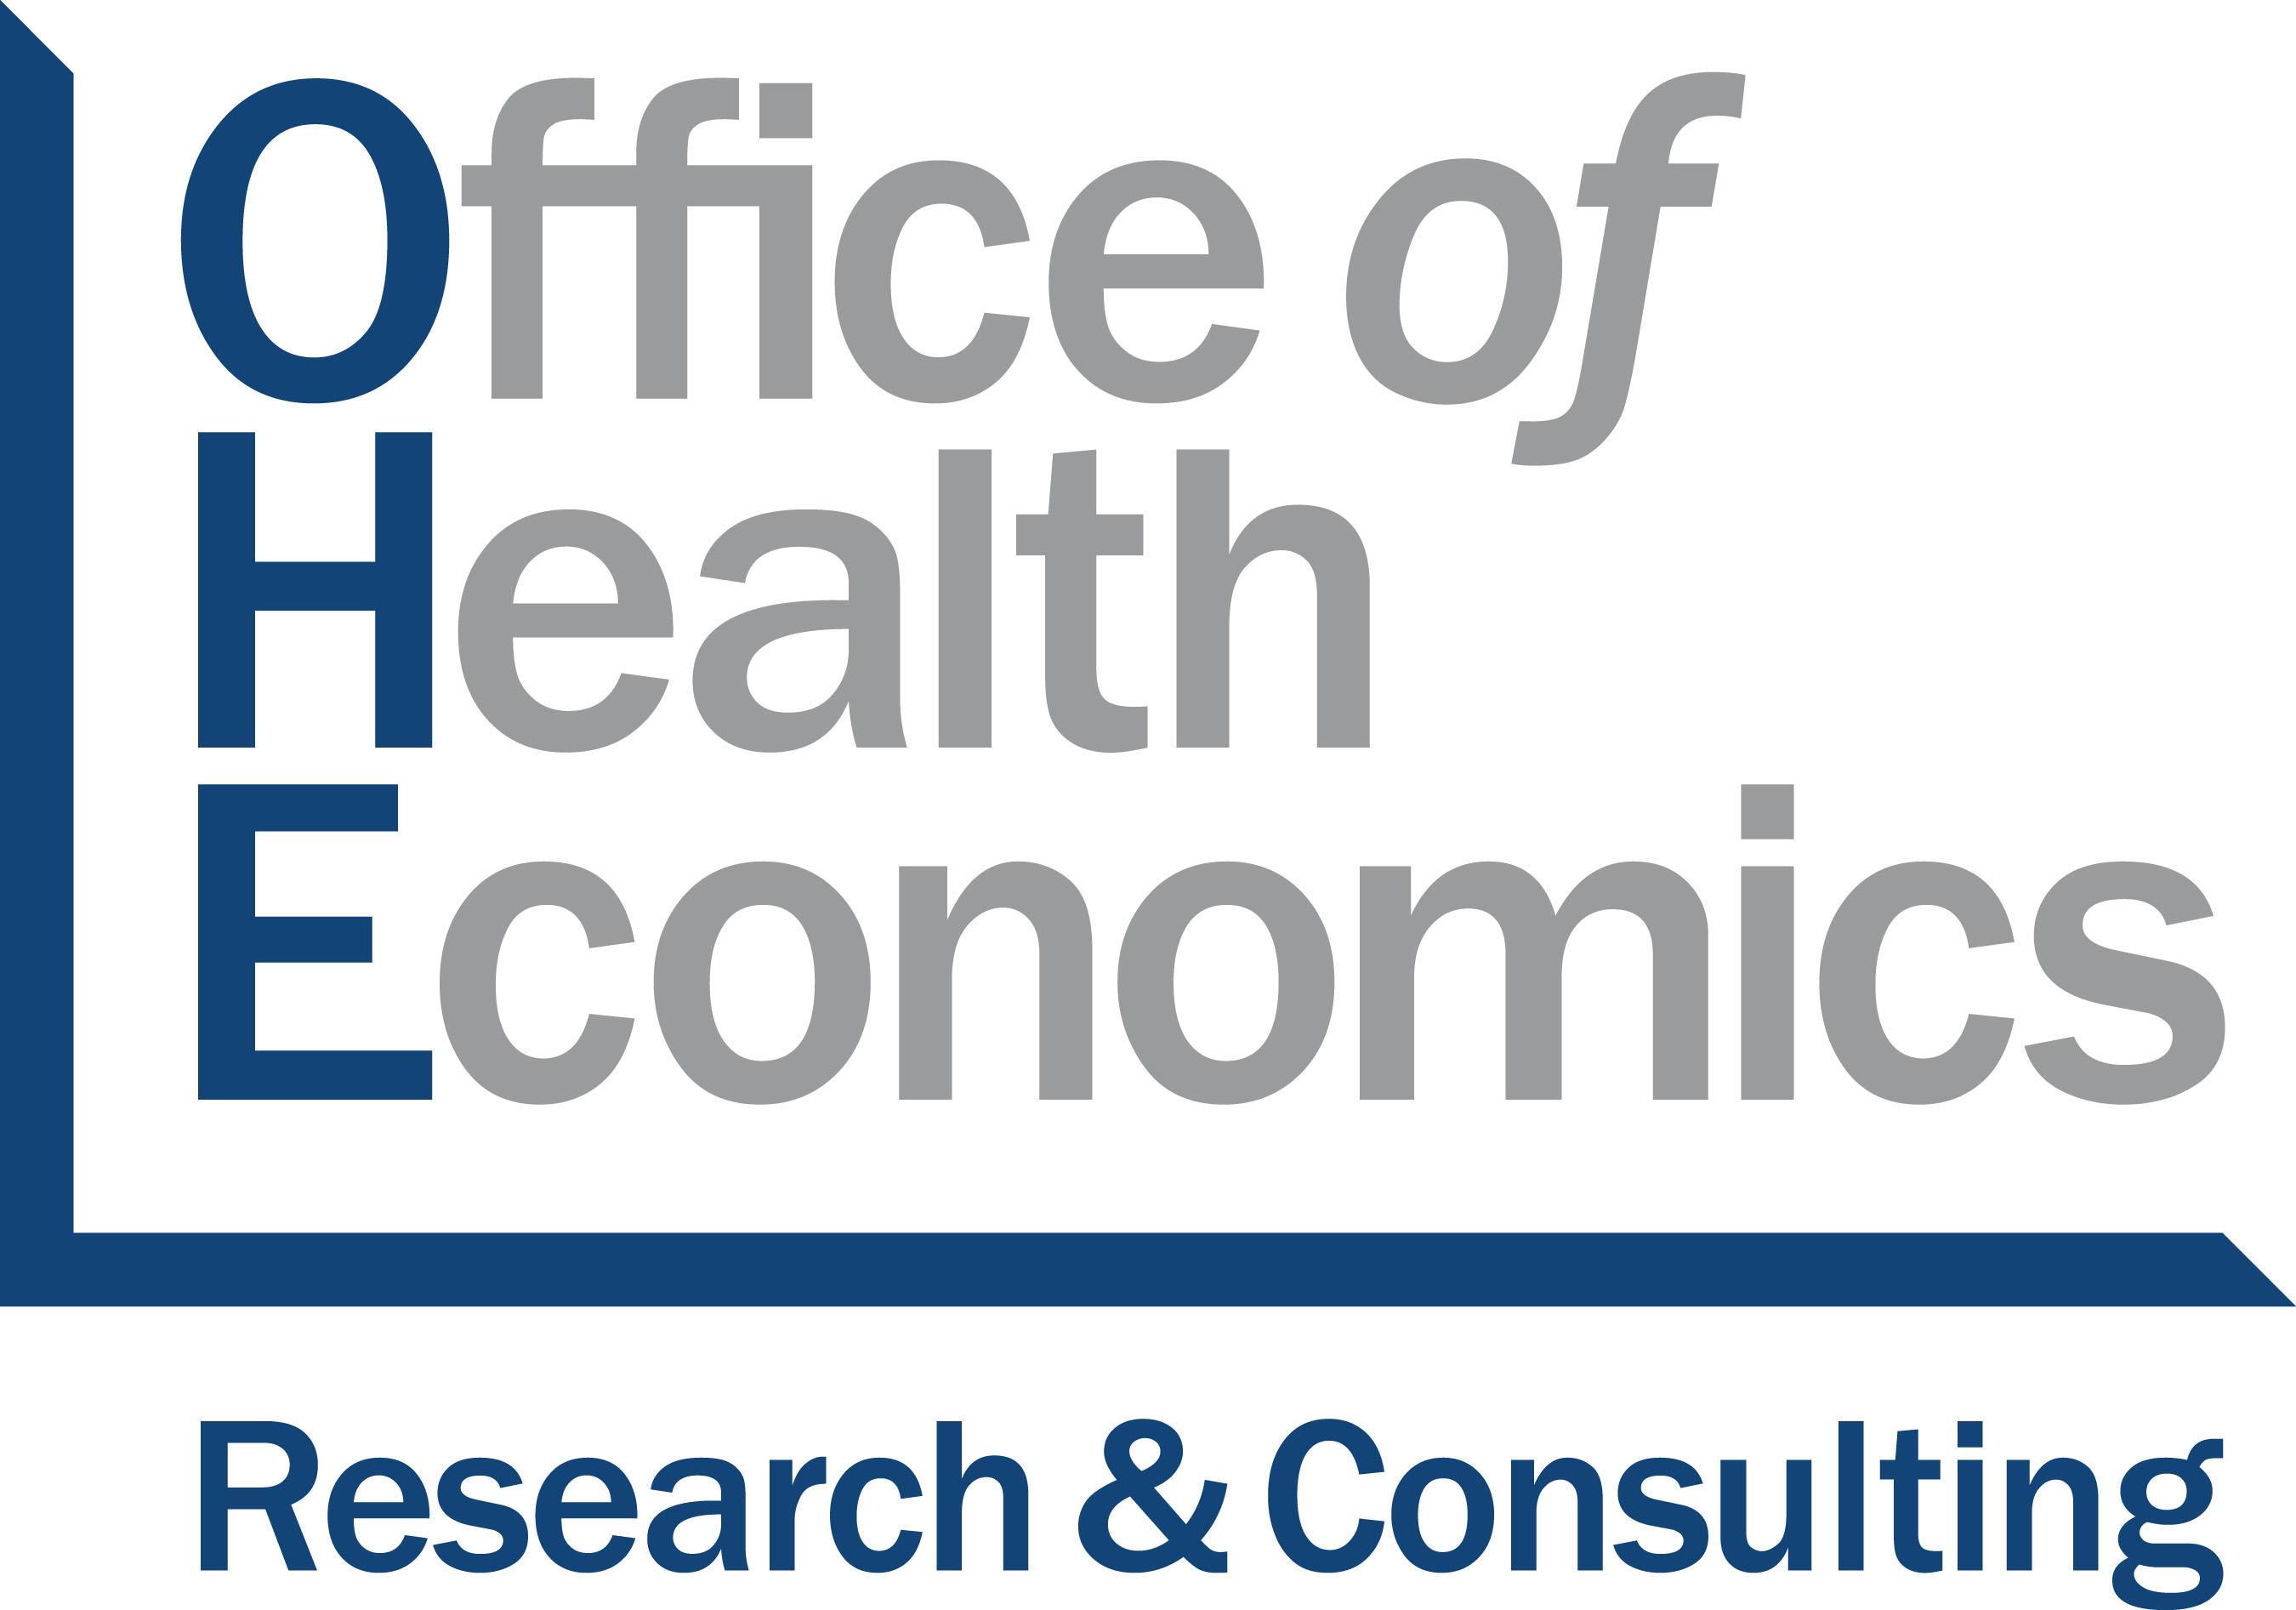 Office of Health Economics. (PRNewsFoto/Office of Health Economics) (PRNewsFoto/OFFICE OF HEALTH ECONOMICS)